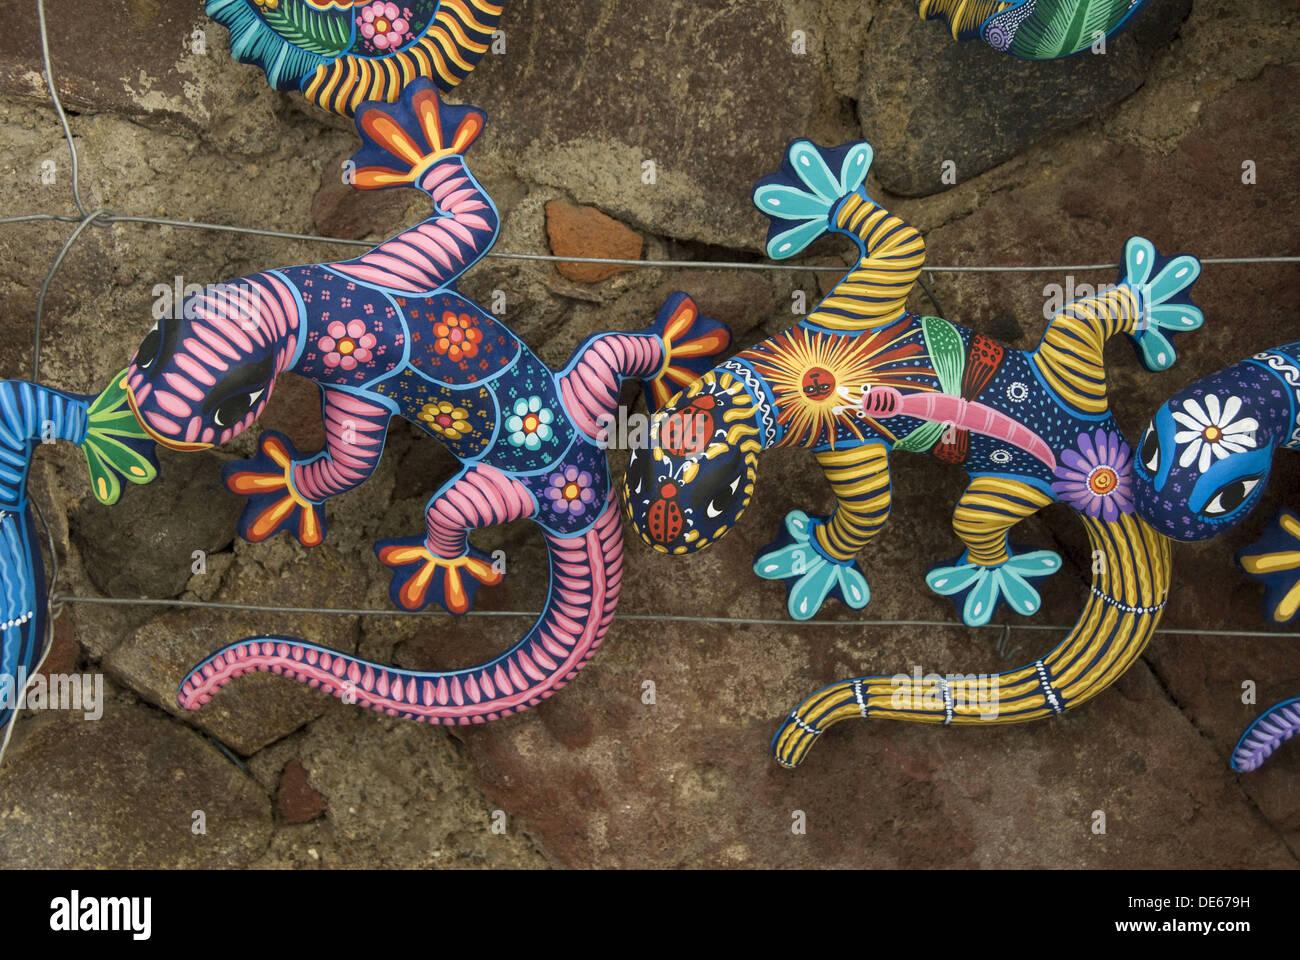 Colorful hand crafted geckos for sale, San Miguel de Allende, Guanajuato, Mexico - Stock Image